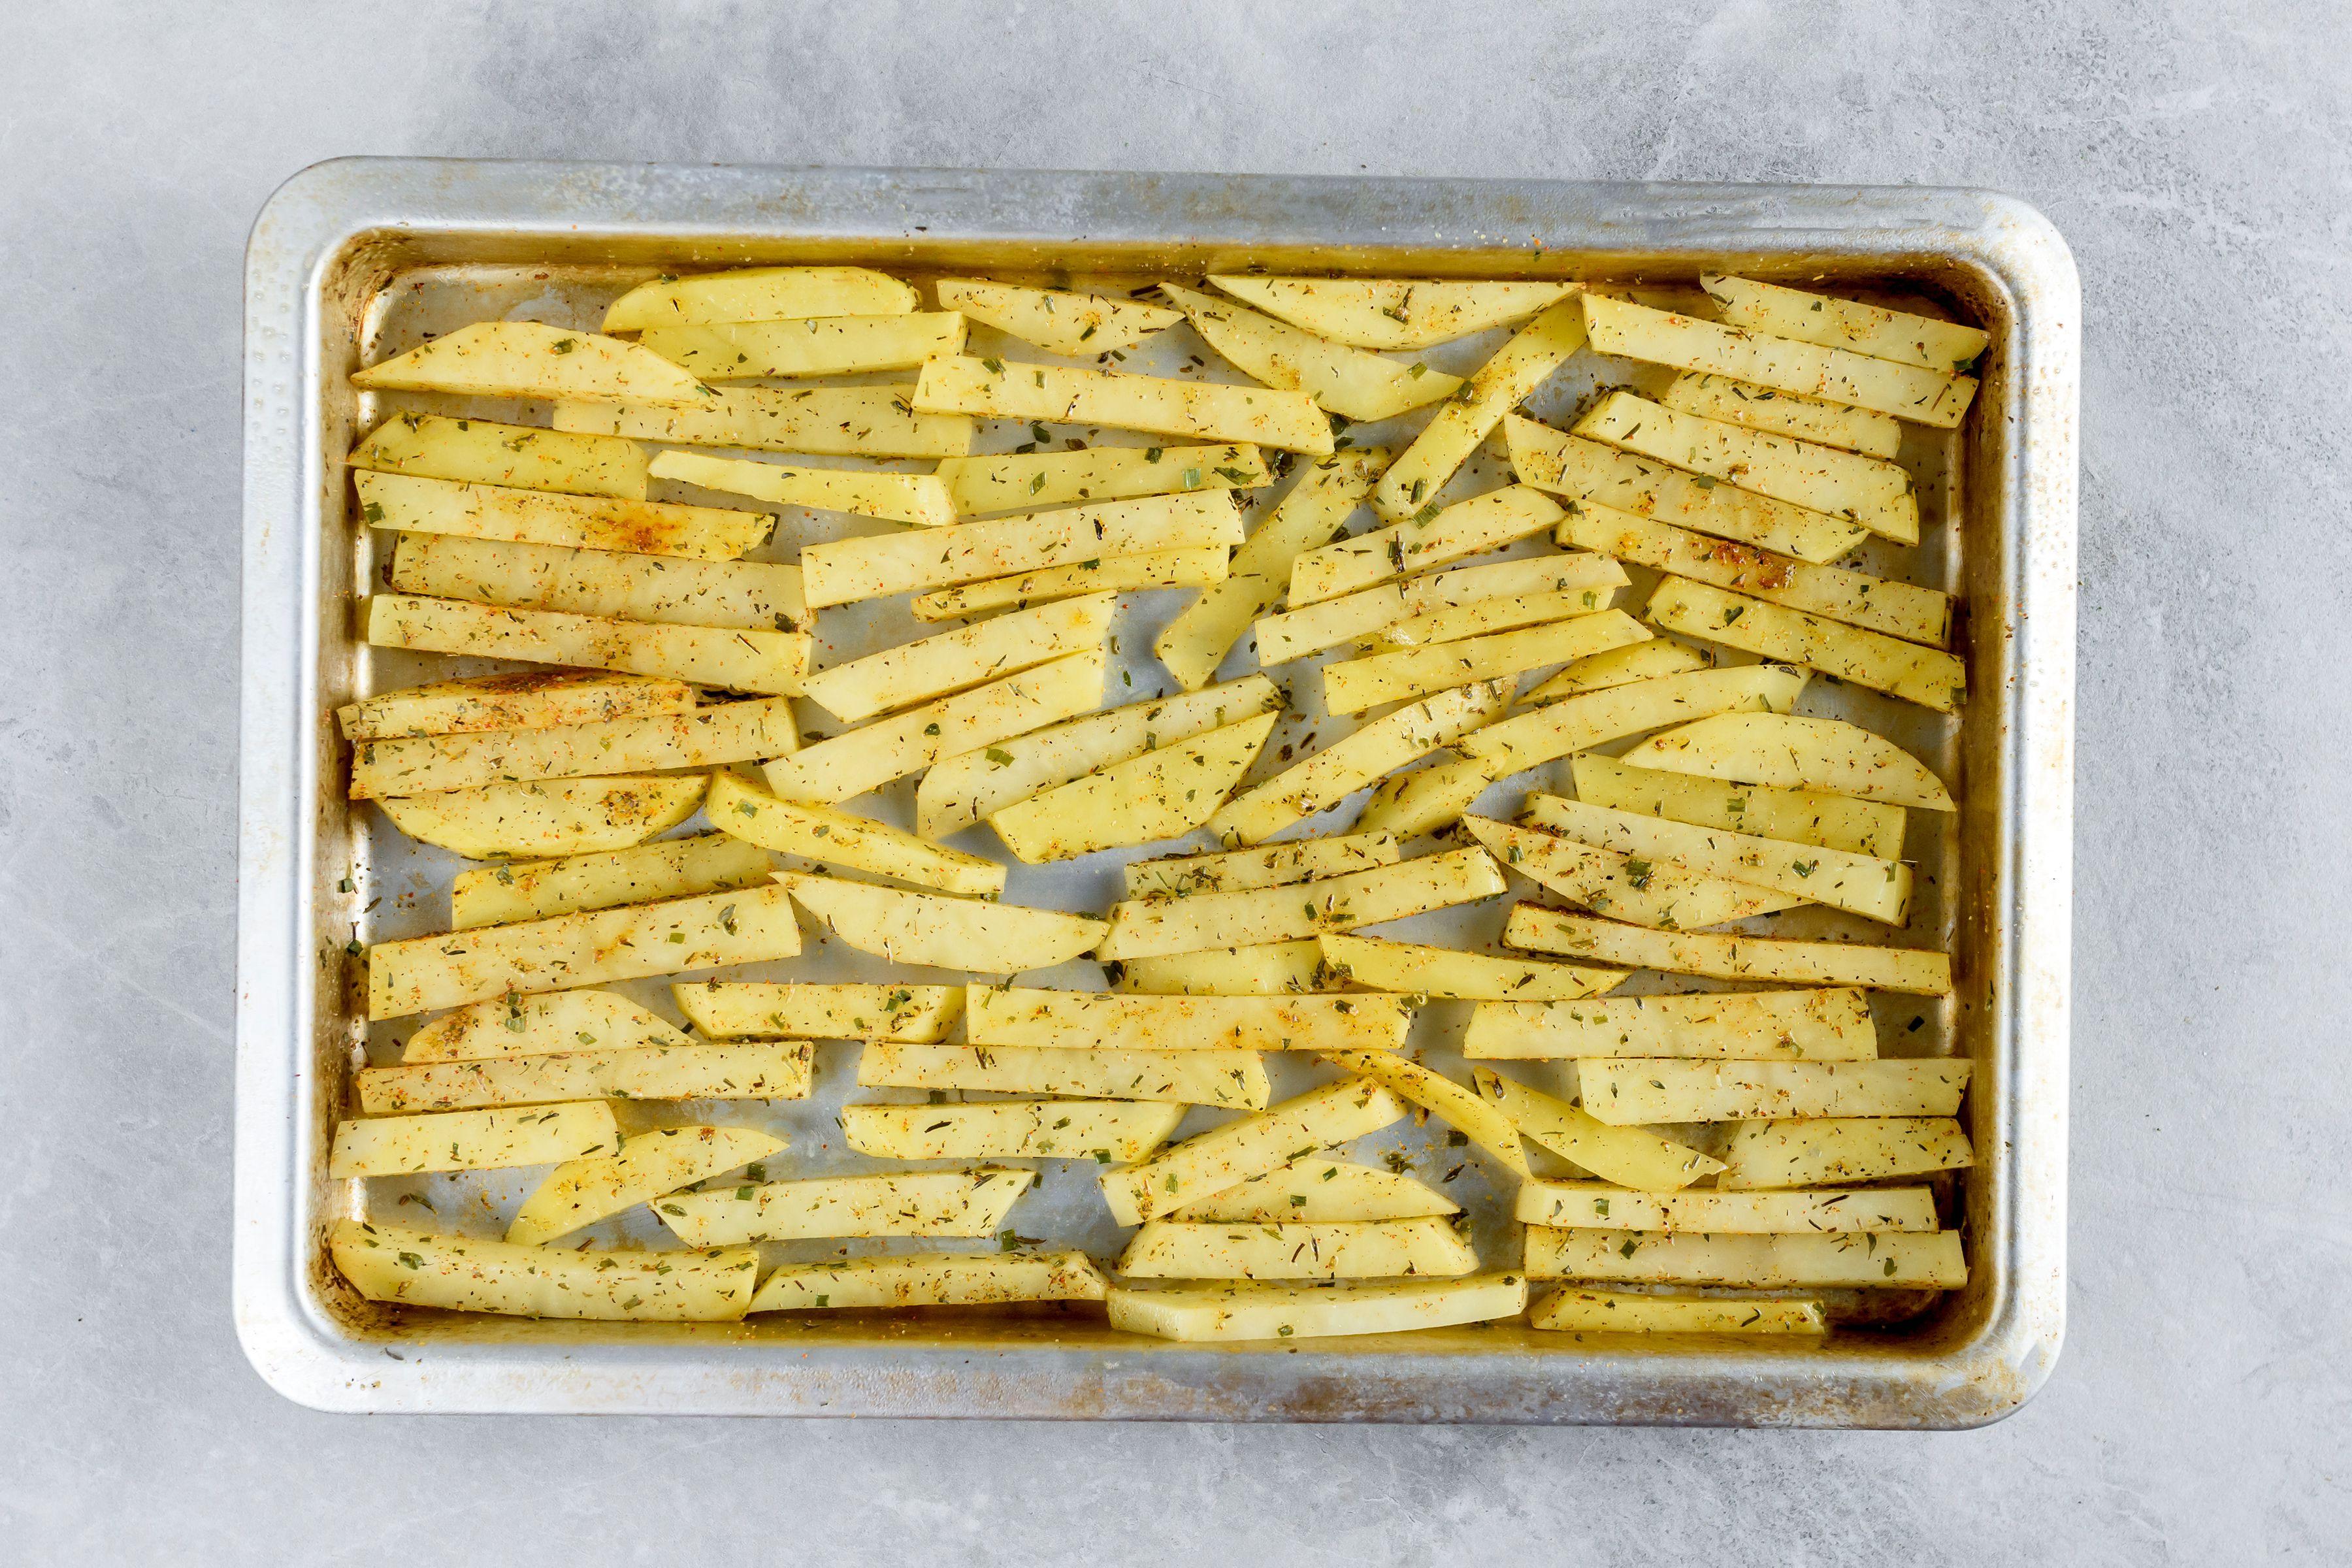 Potatoes arranged on a baking sheet